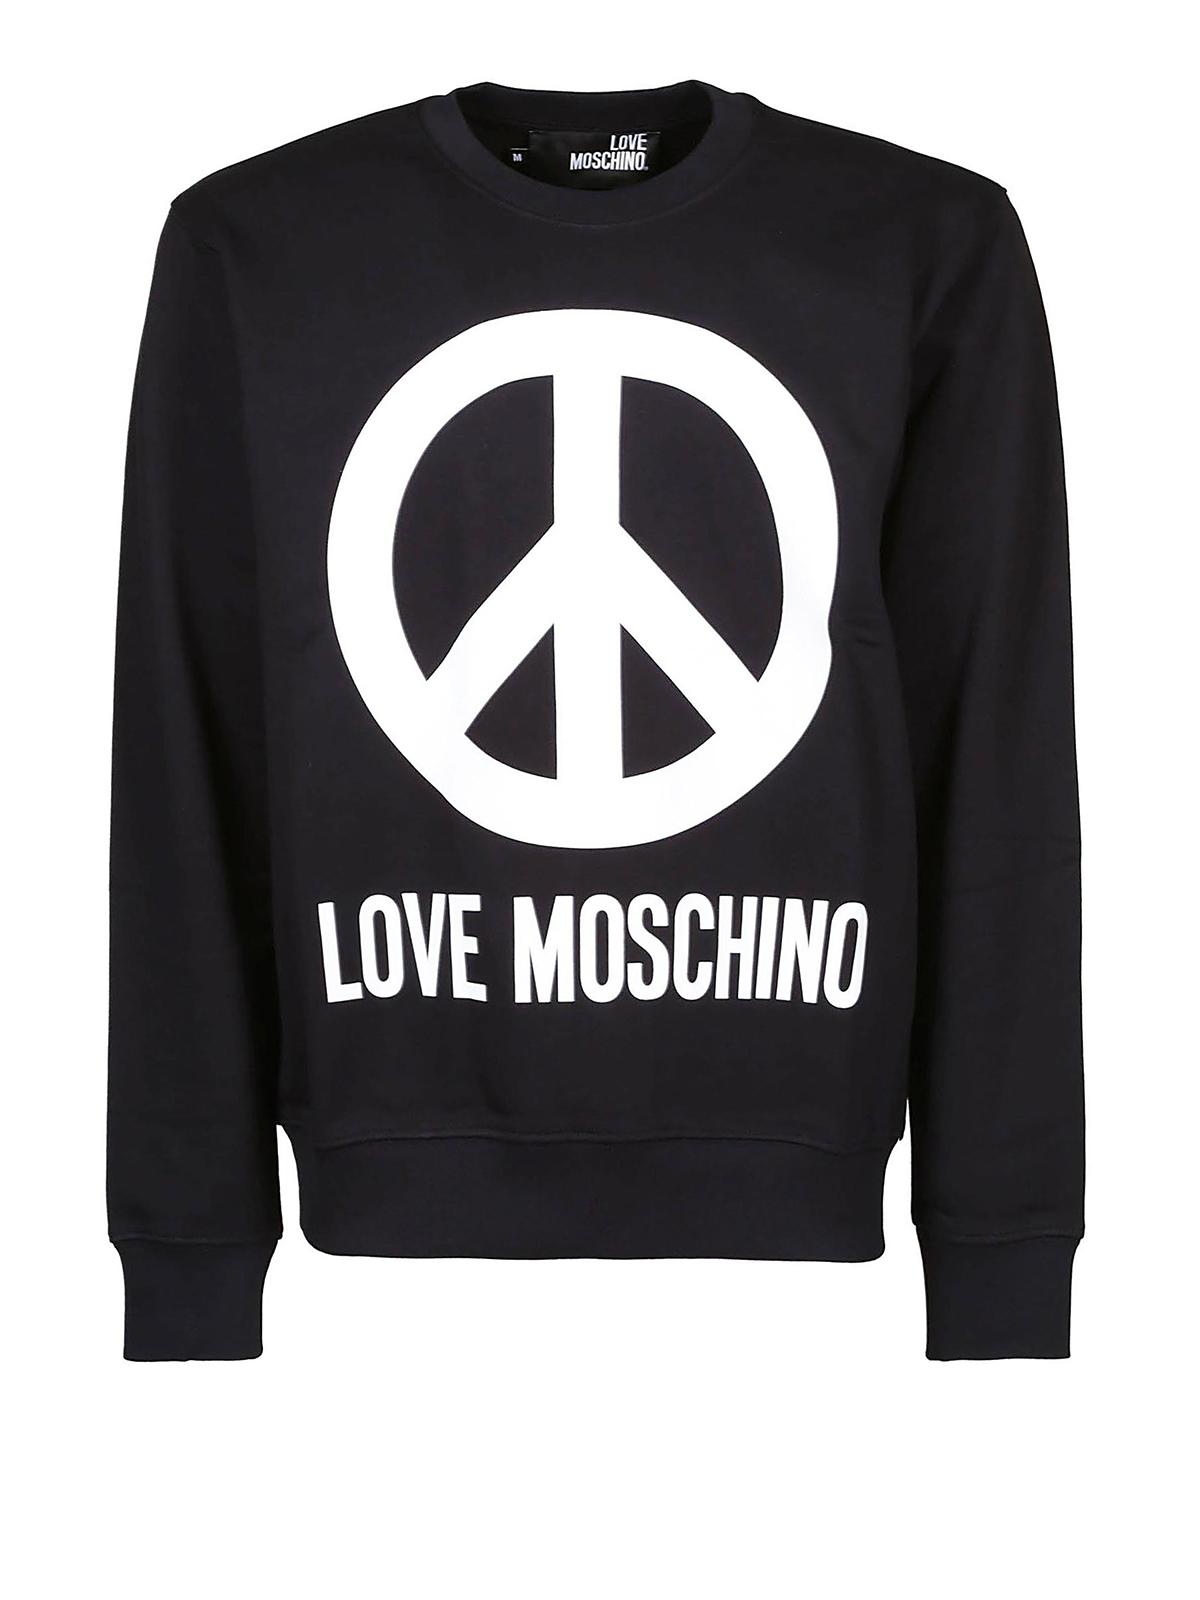 Love Noir Moschino Sweatshirts Pulls Sweat amp; Shirts z7zgwqrZ